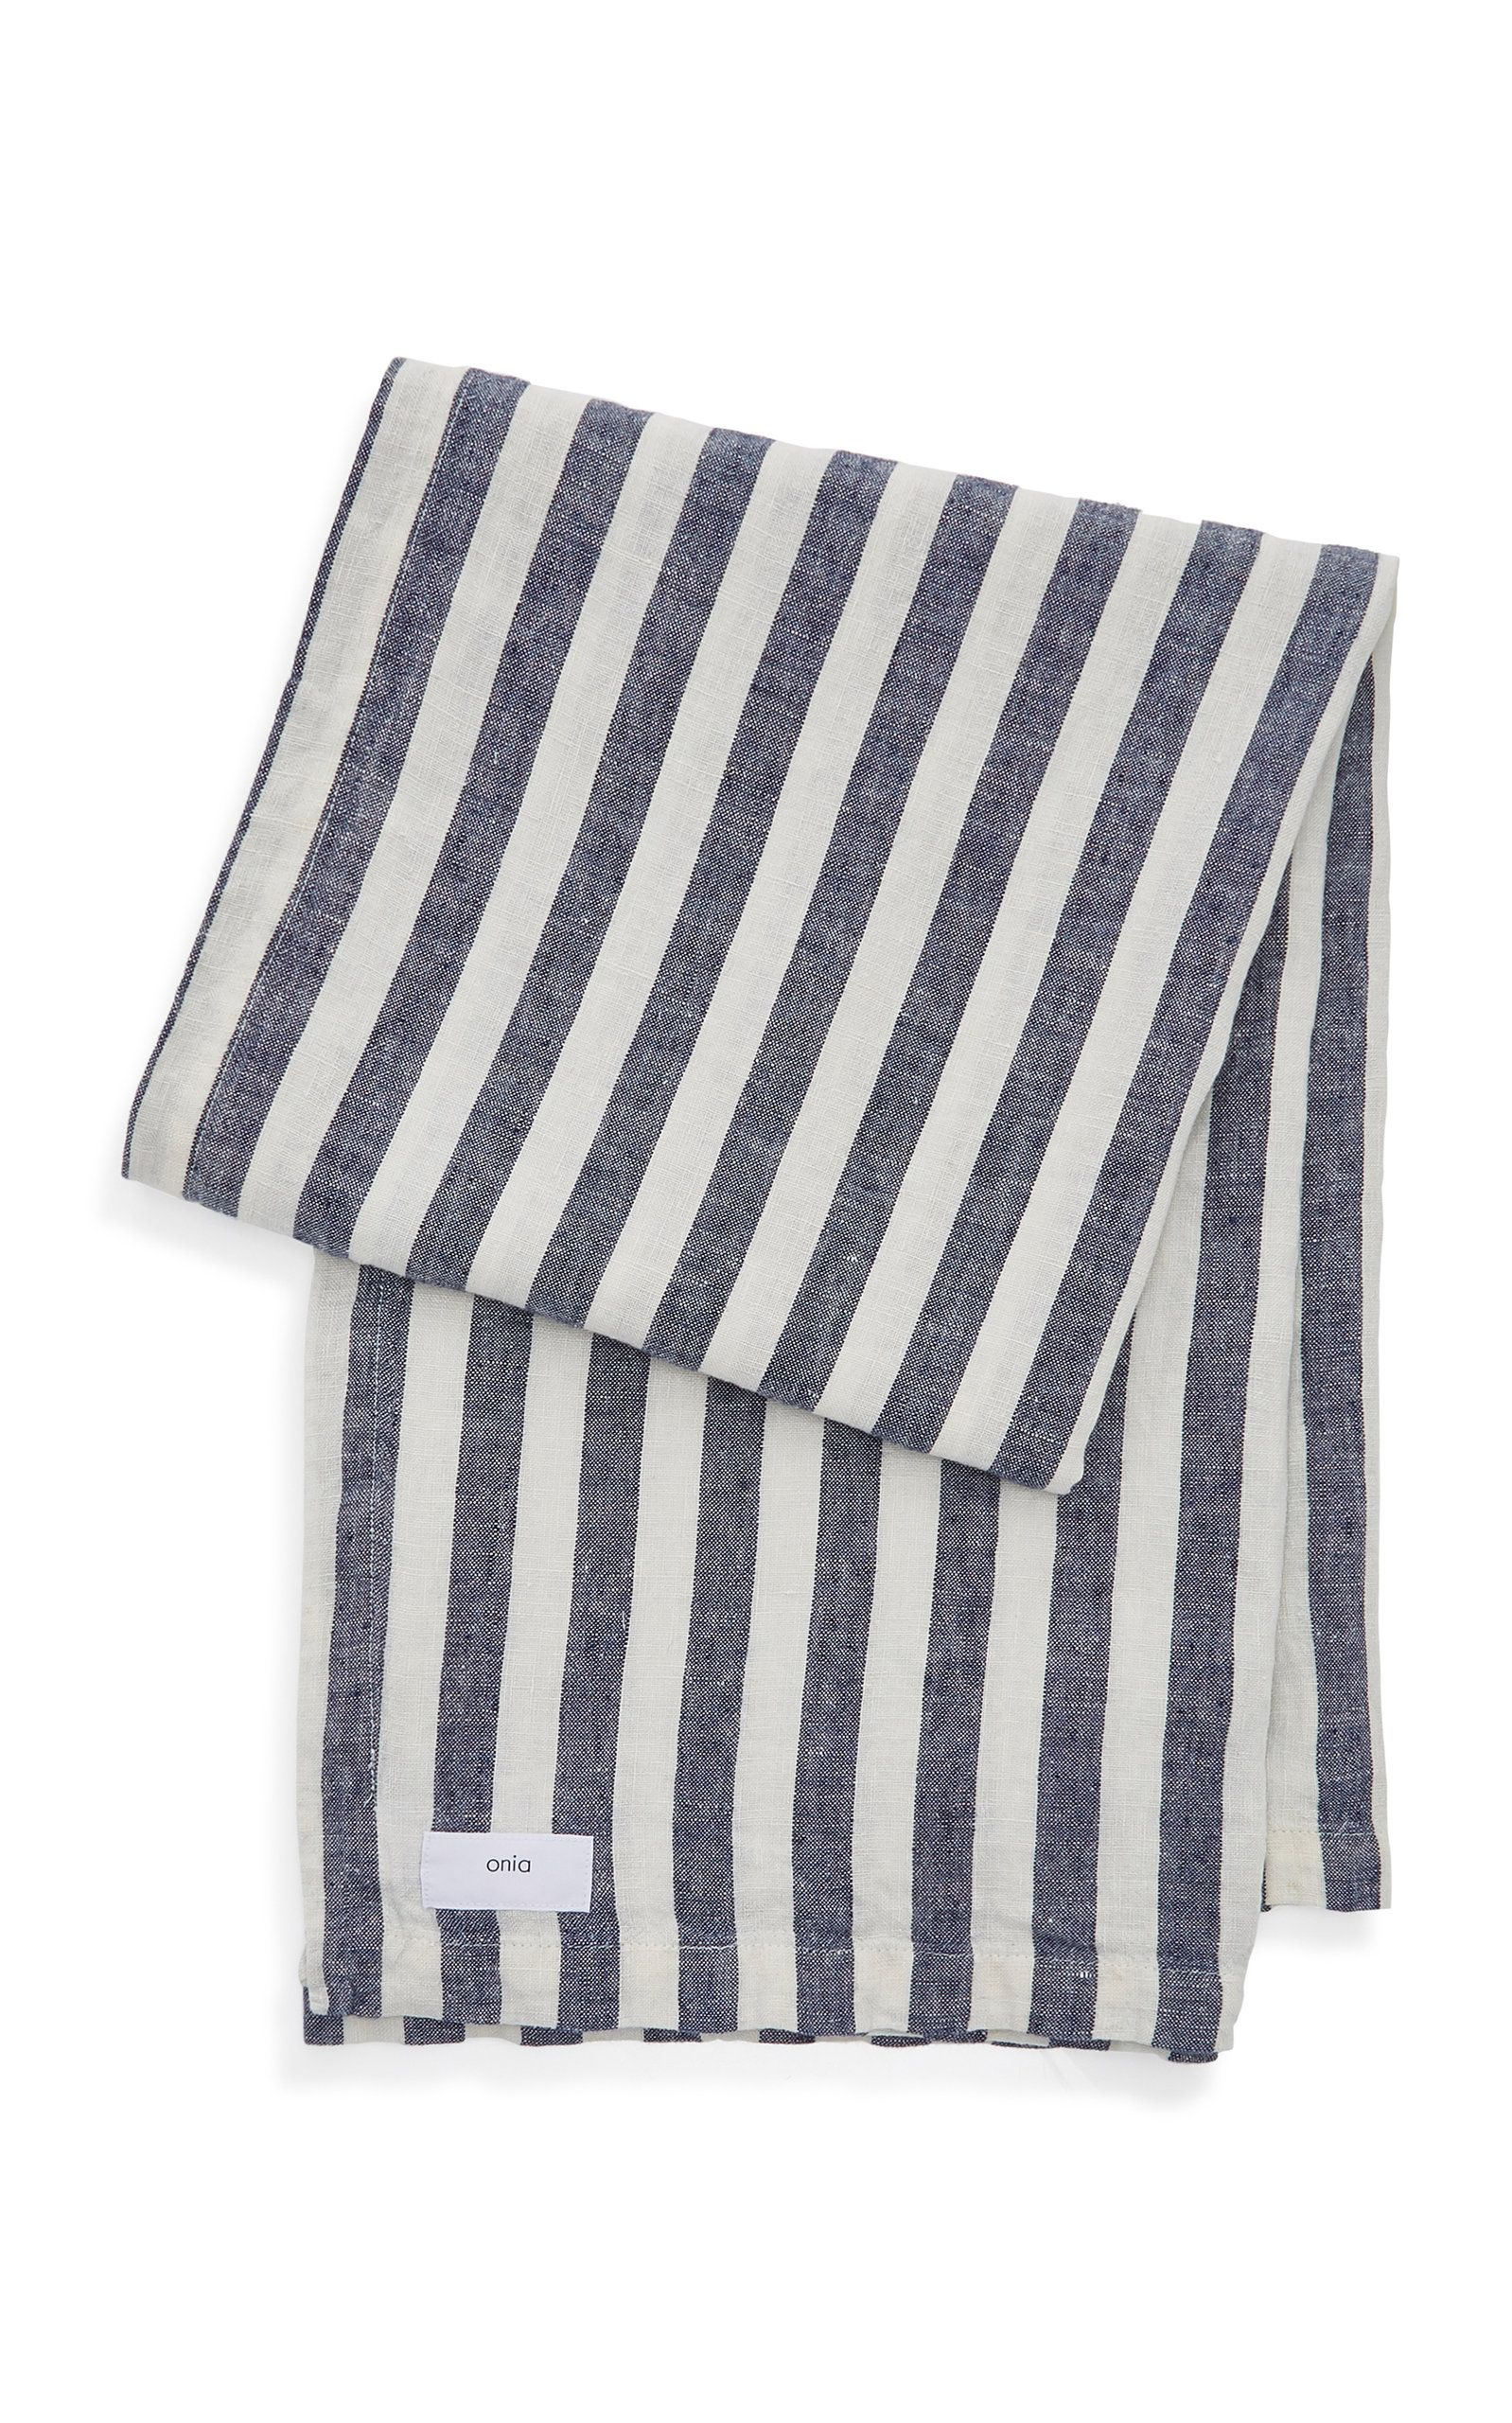 Onia Striped Linen Beach Blanket Beach Blanket Striped Linen Linen